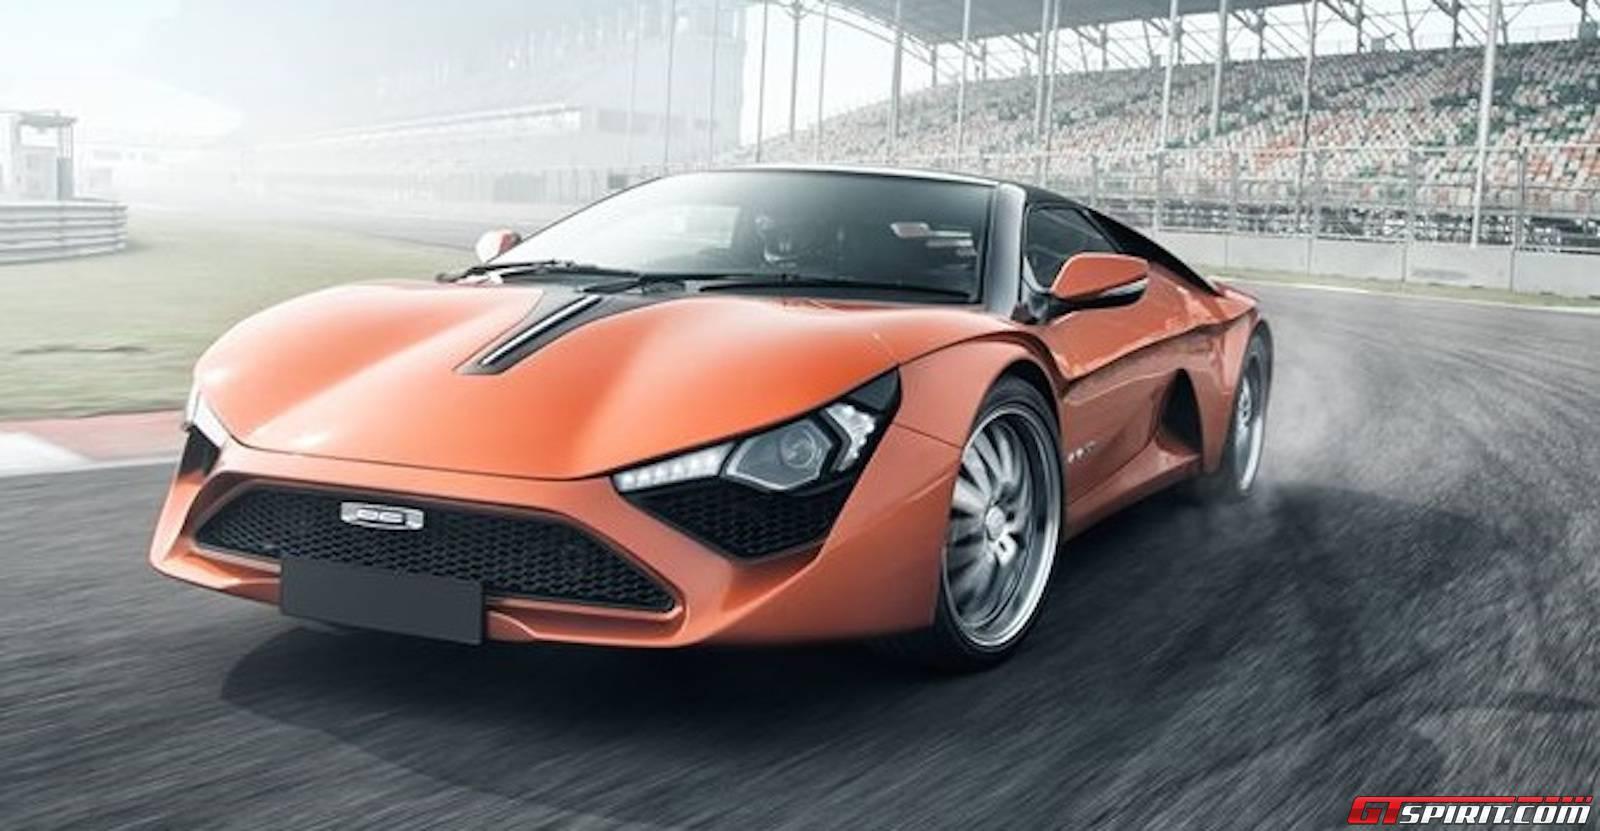 Dc Avanti Wallpaper Orange And Black The Dc Avanti Is Indias First Indigenous Sportscar